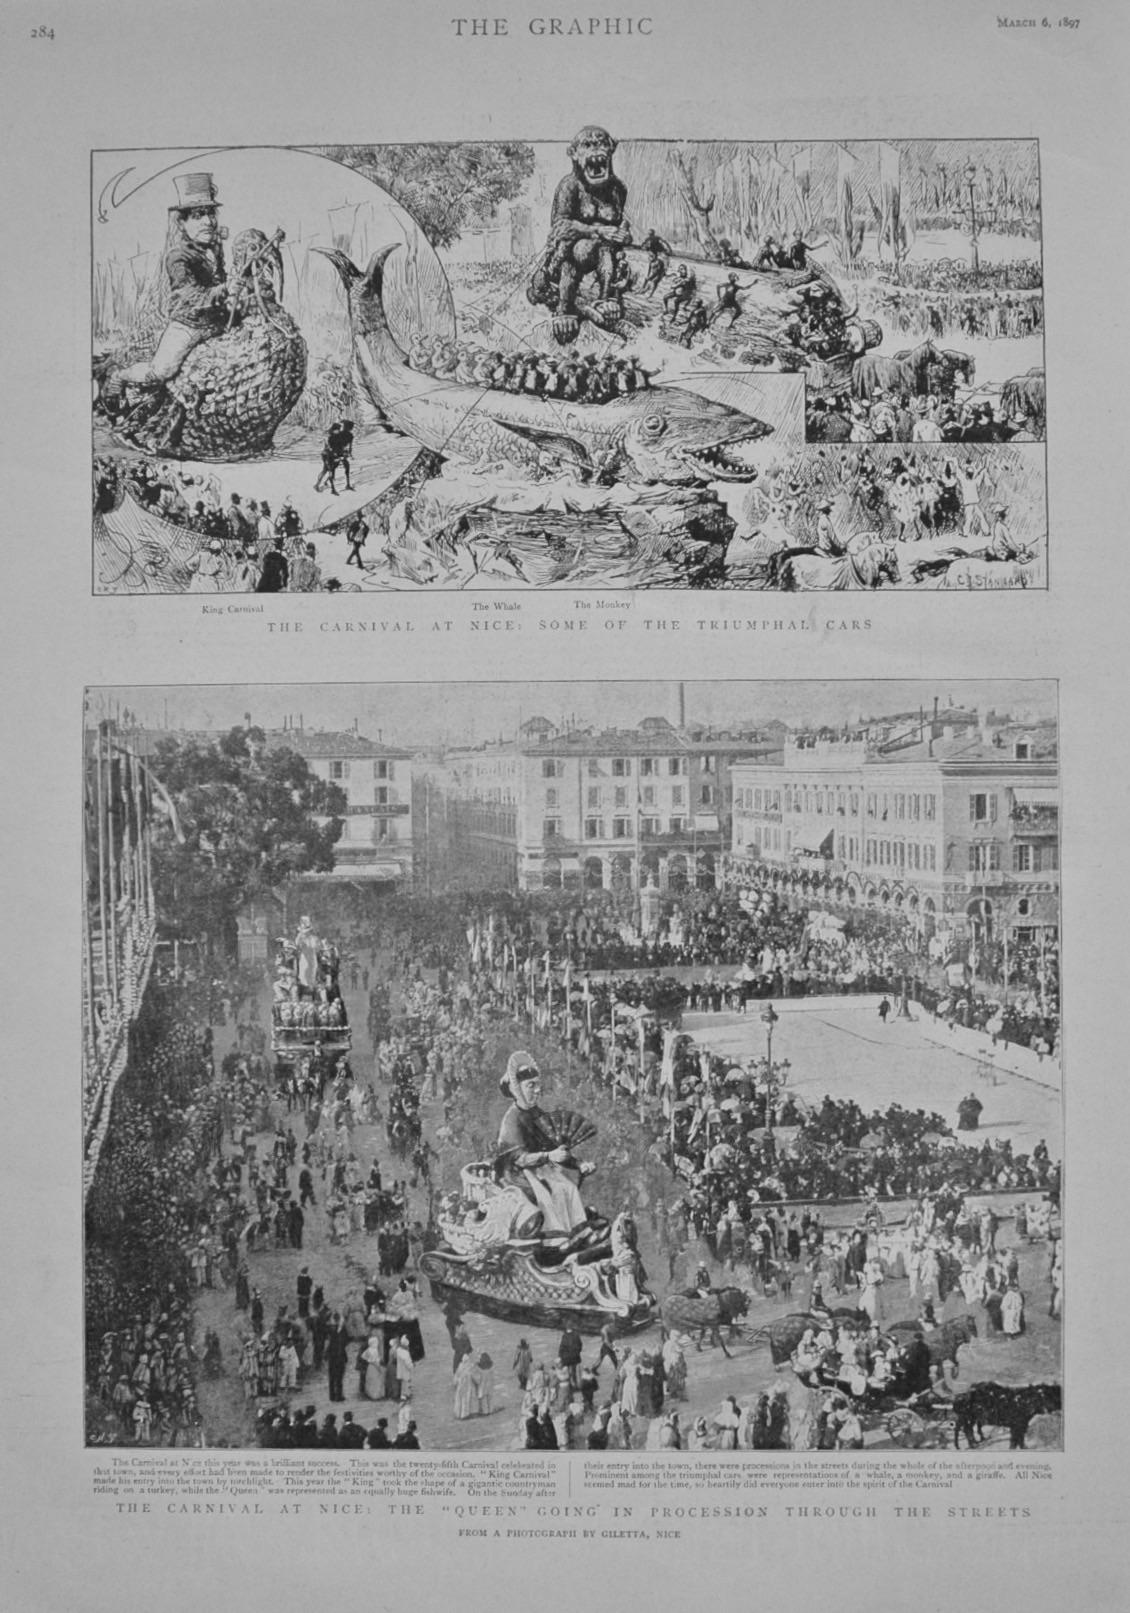 The Carnival at Nice - 1897